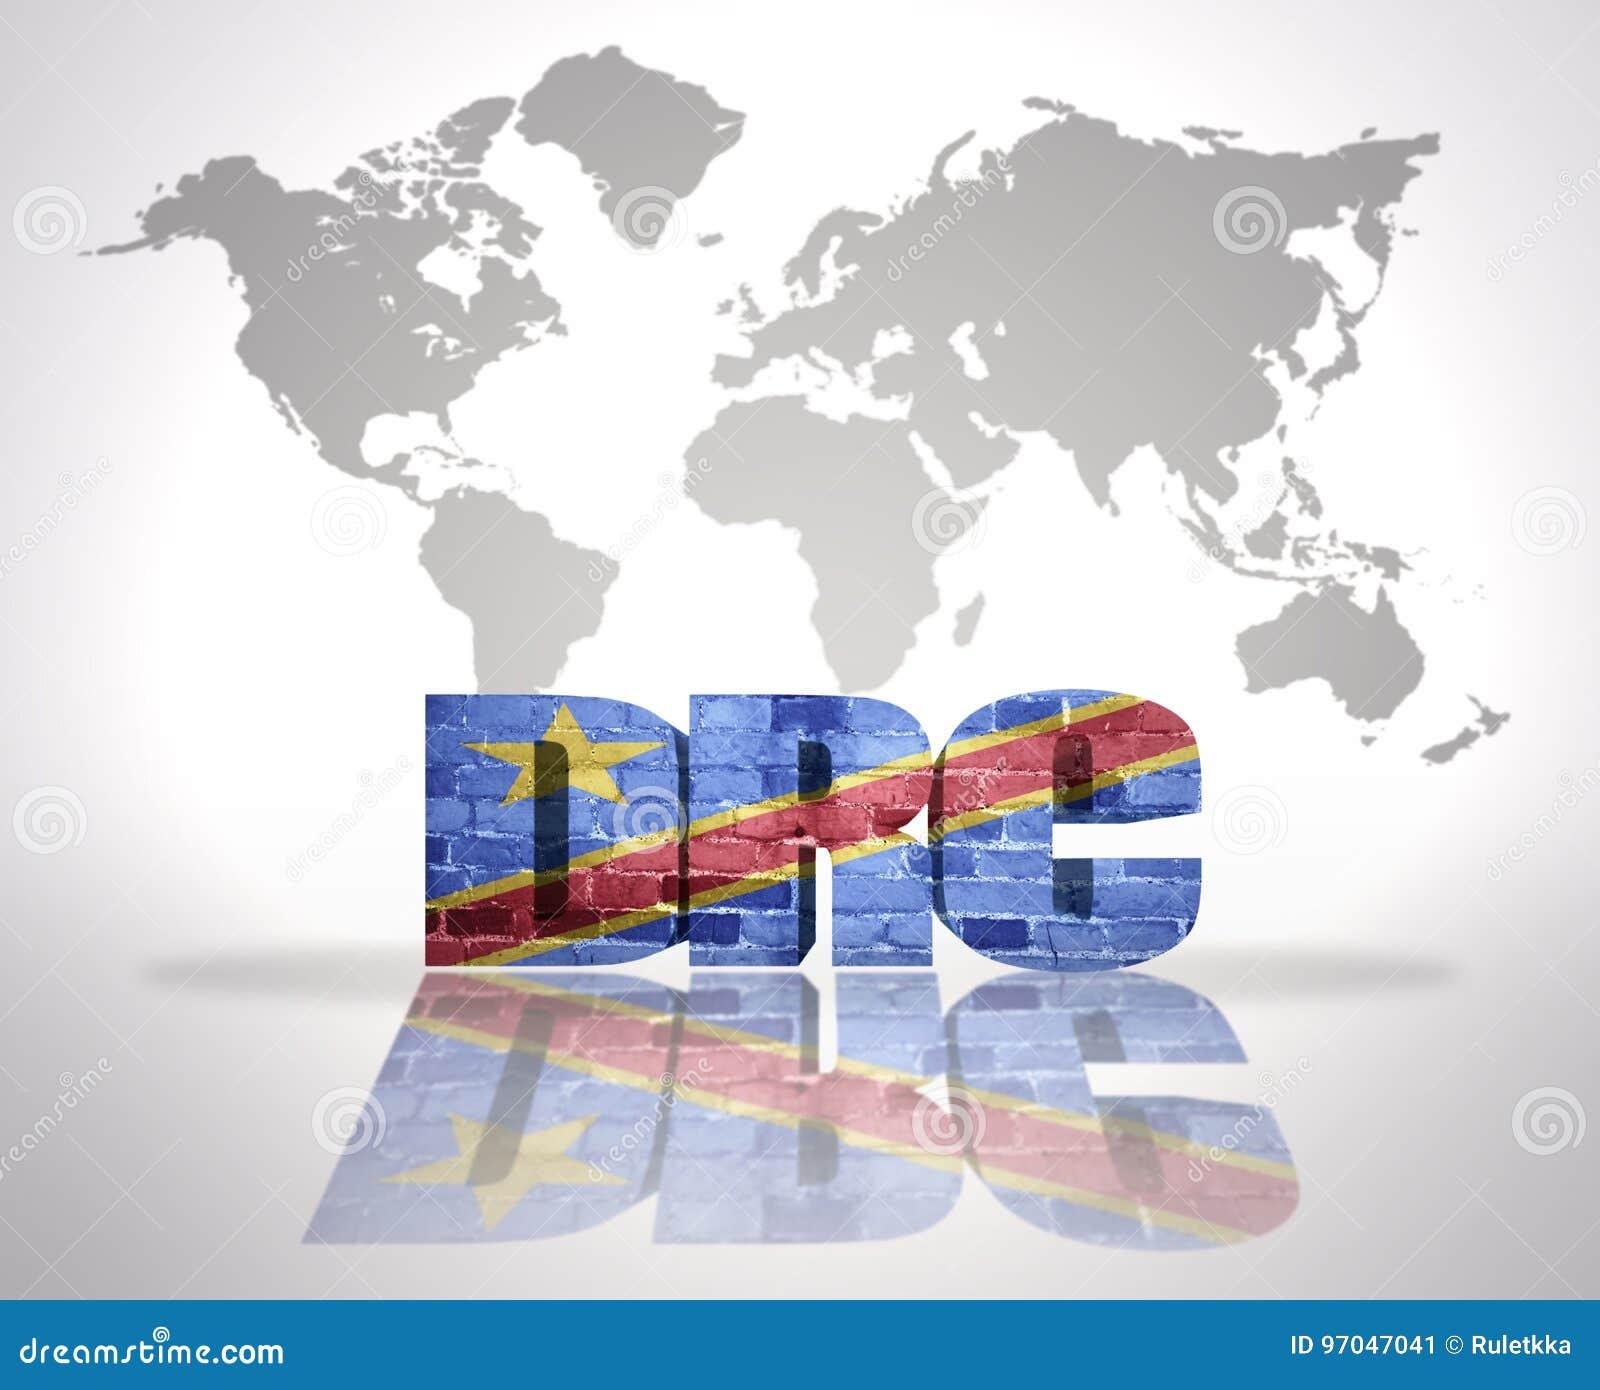 Democratic World Map.Word Drc On A World Map Background Stock Illustration Illustration